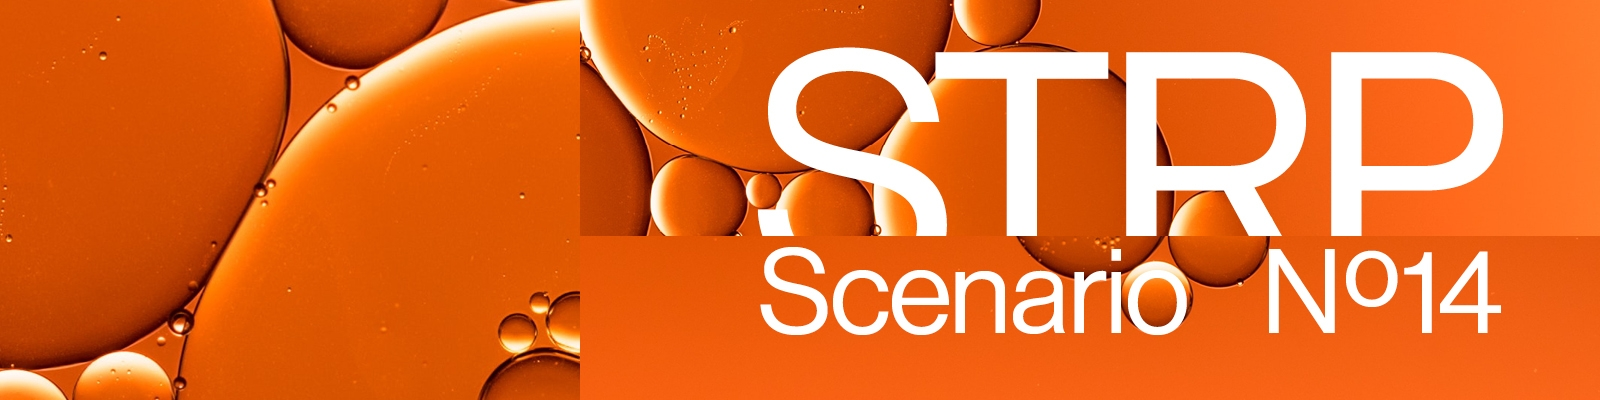 STRP 2021 Social Li Event Scenario14 1600x400